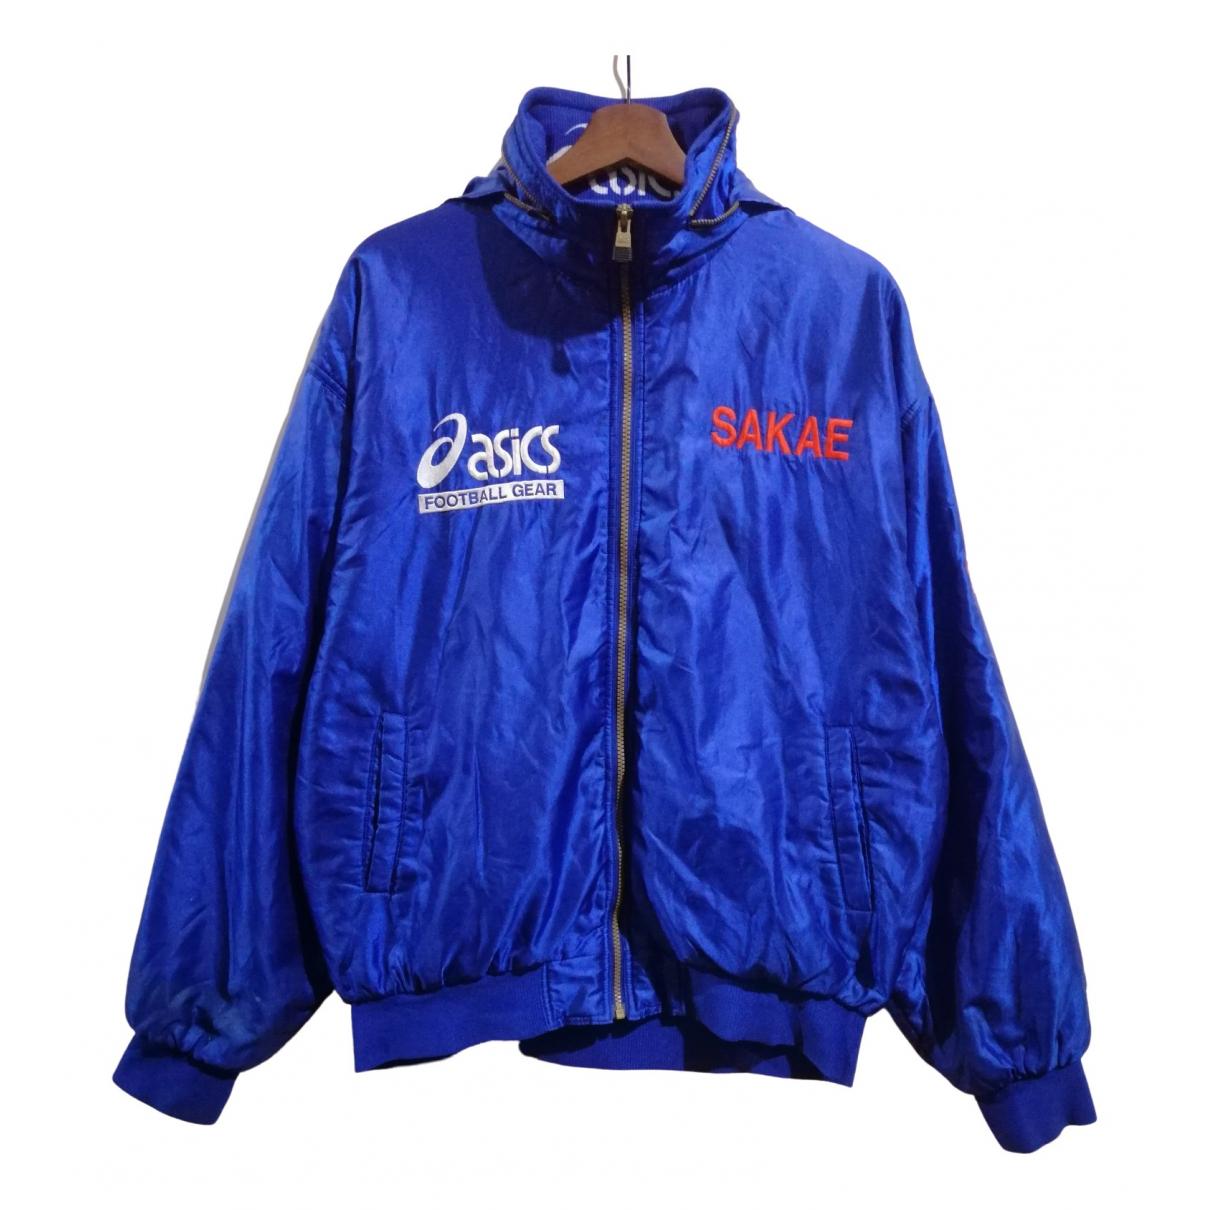 Asics \N Jacke in  Blau Polyester